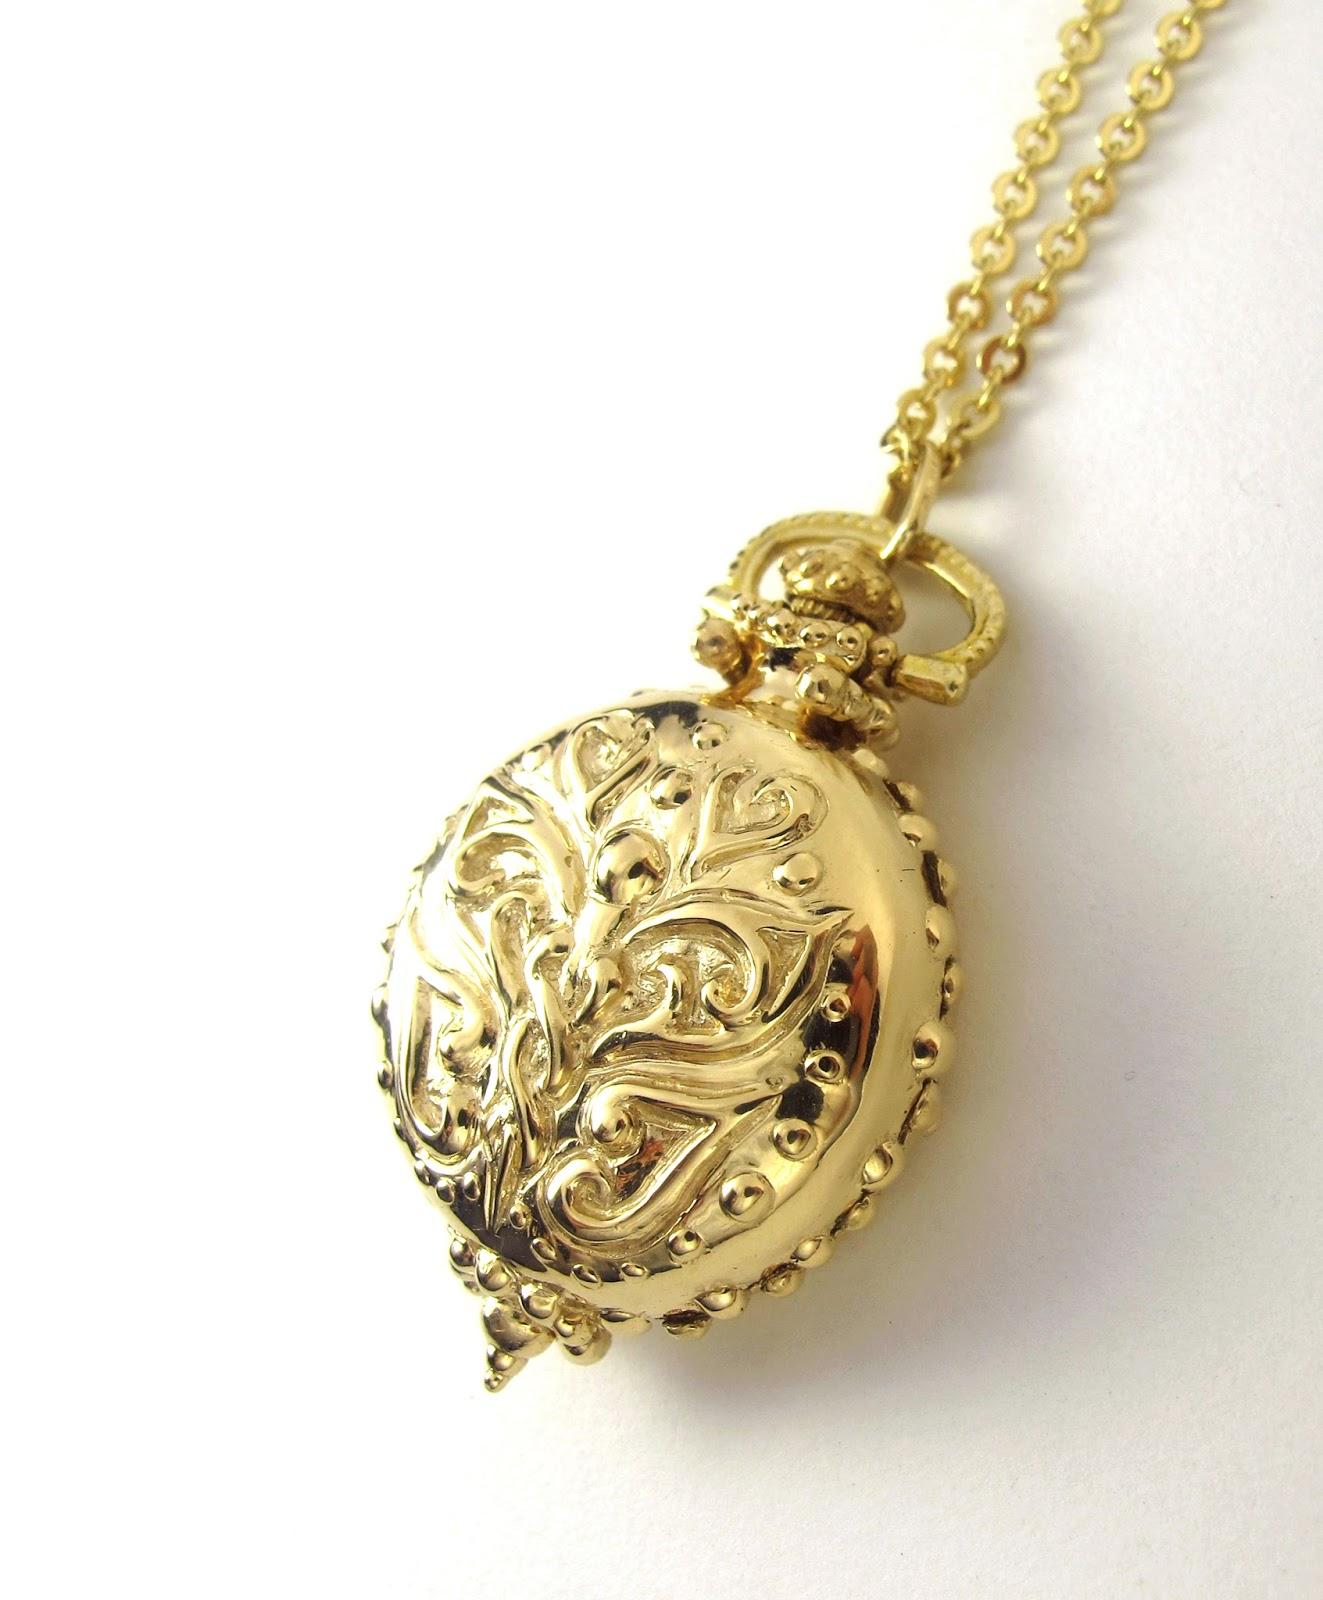 rickson jewellery bespoke s gold pendant